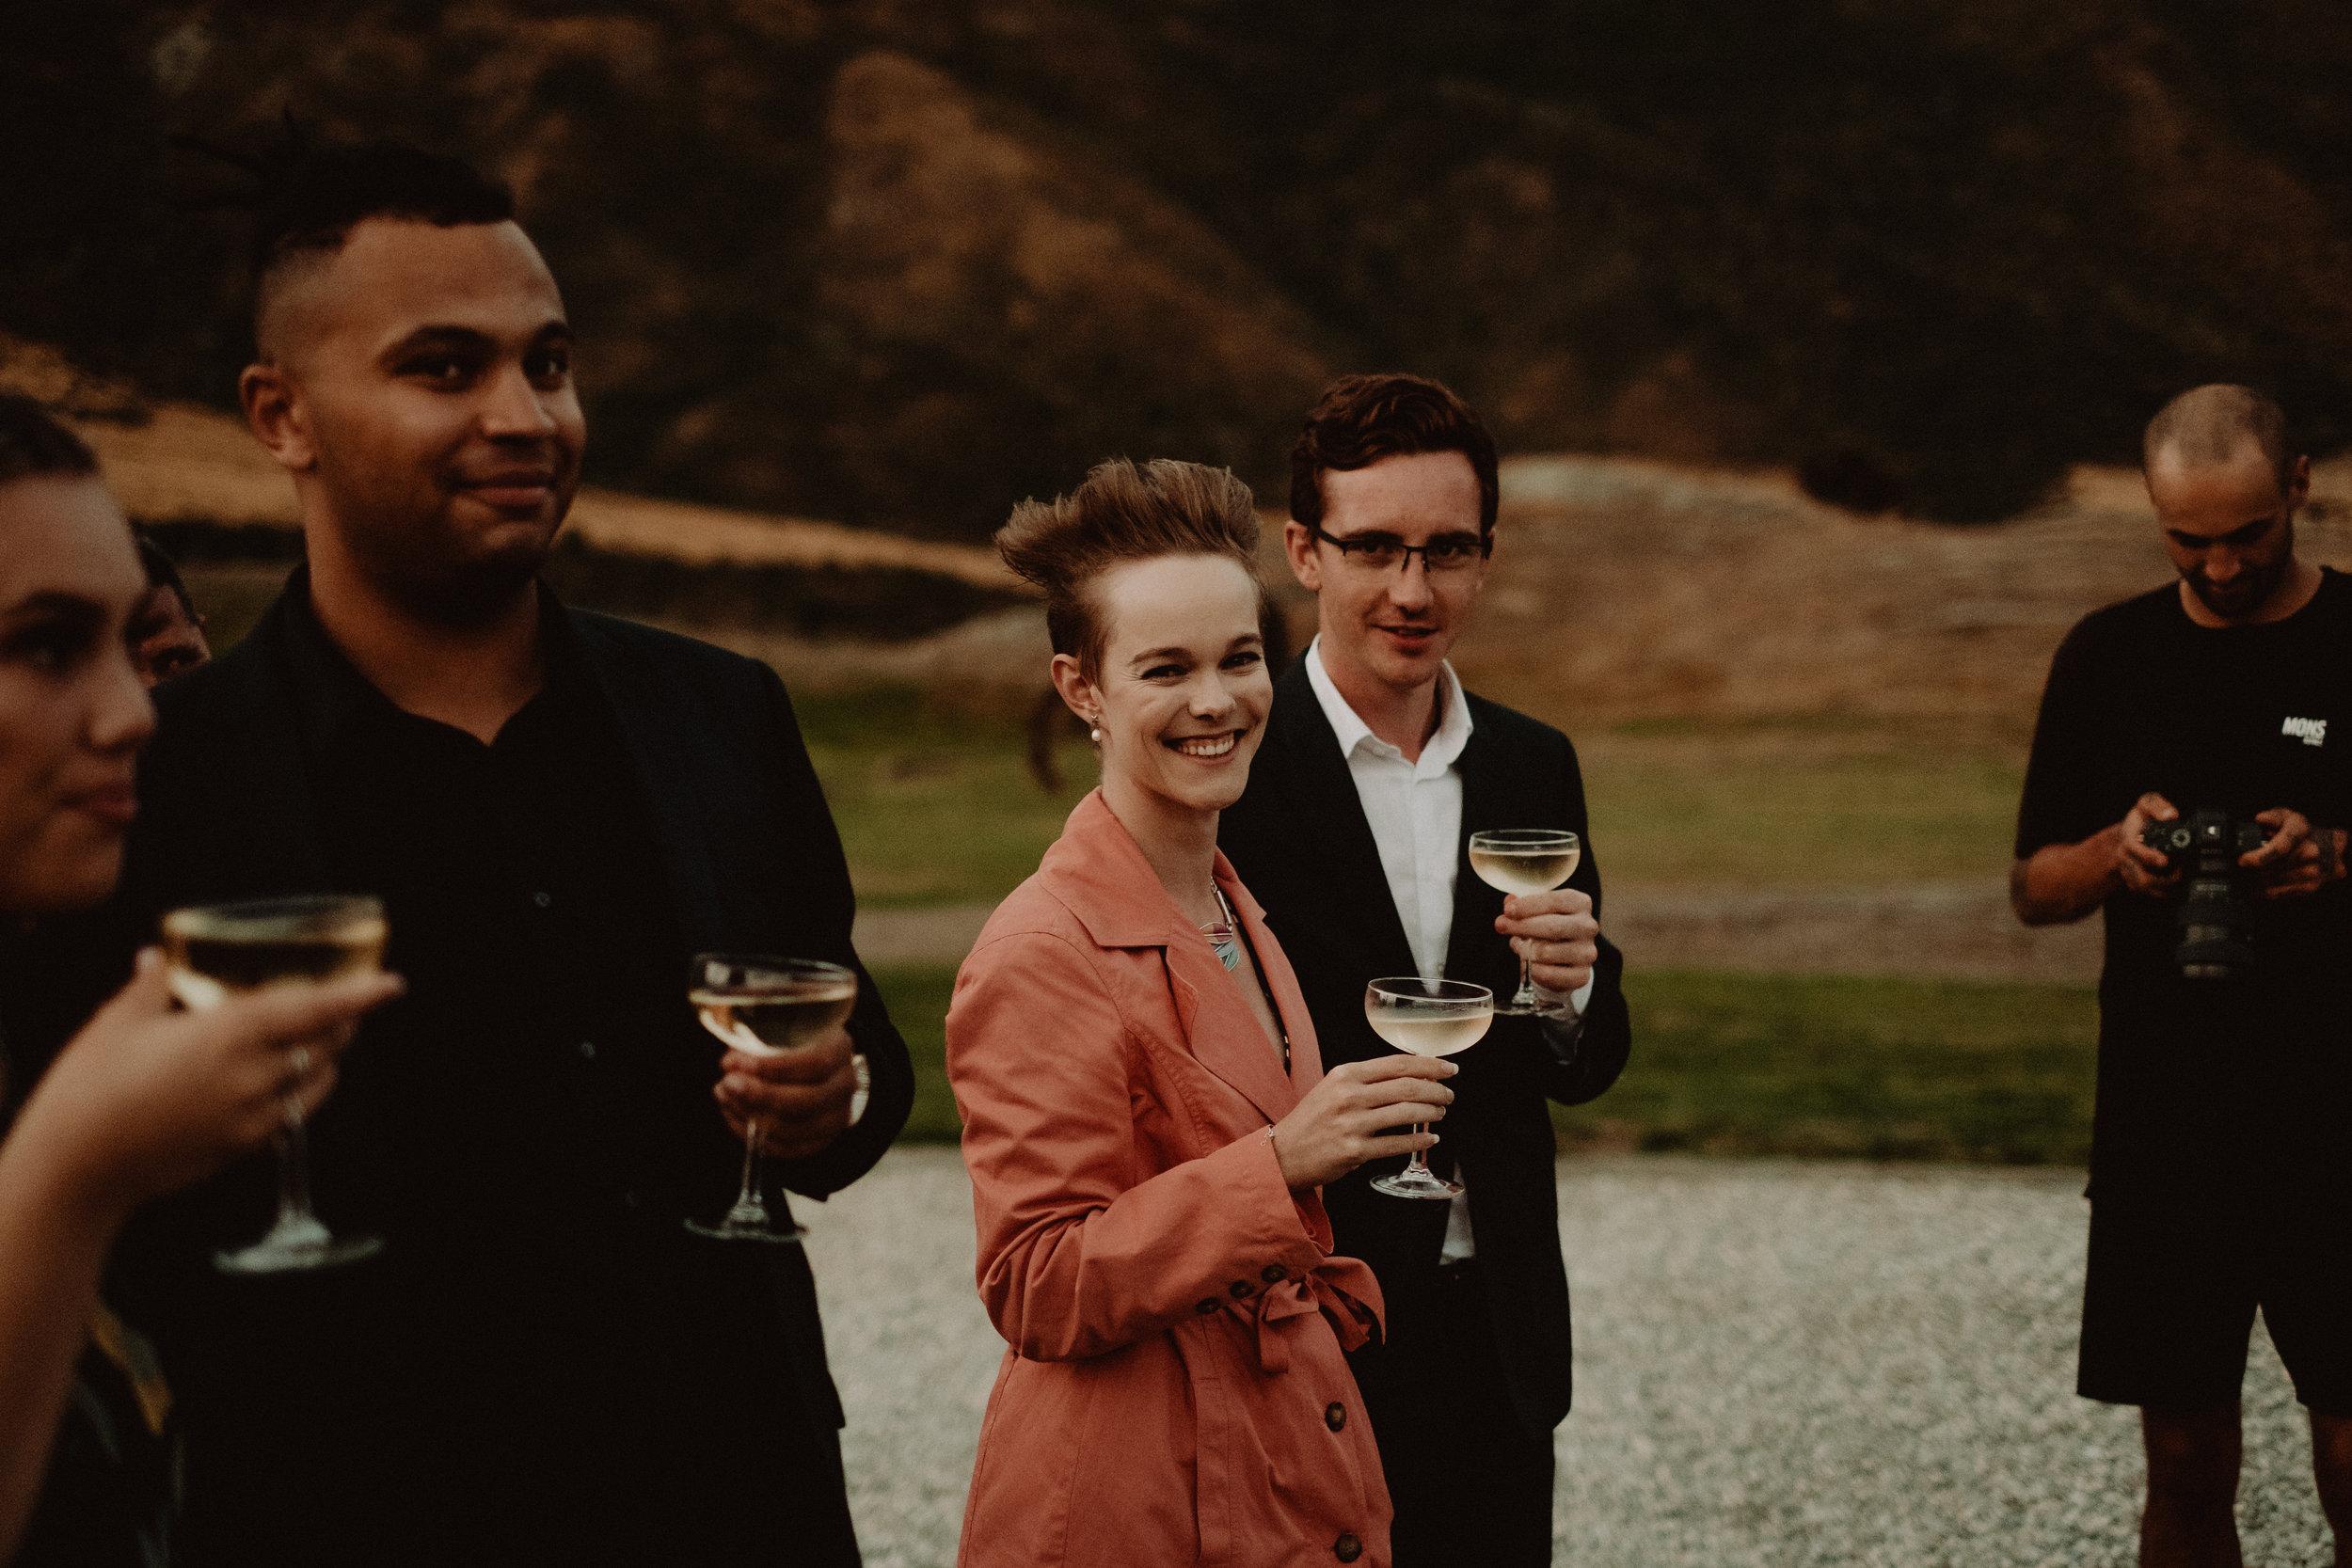 perrigrine wines wedding kseniya and travis chellise michael photography742.JPG